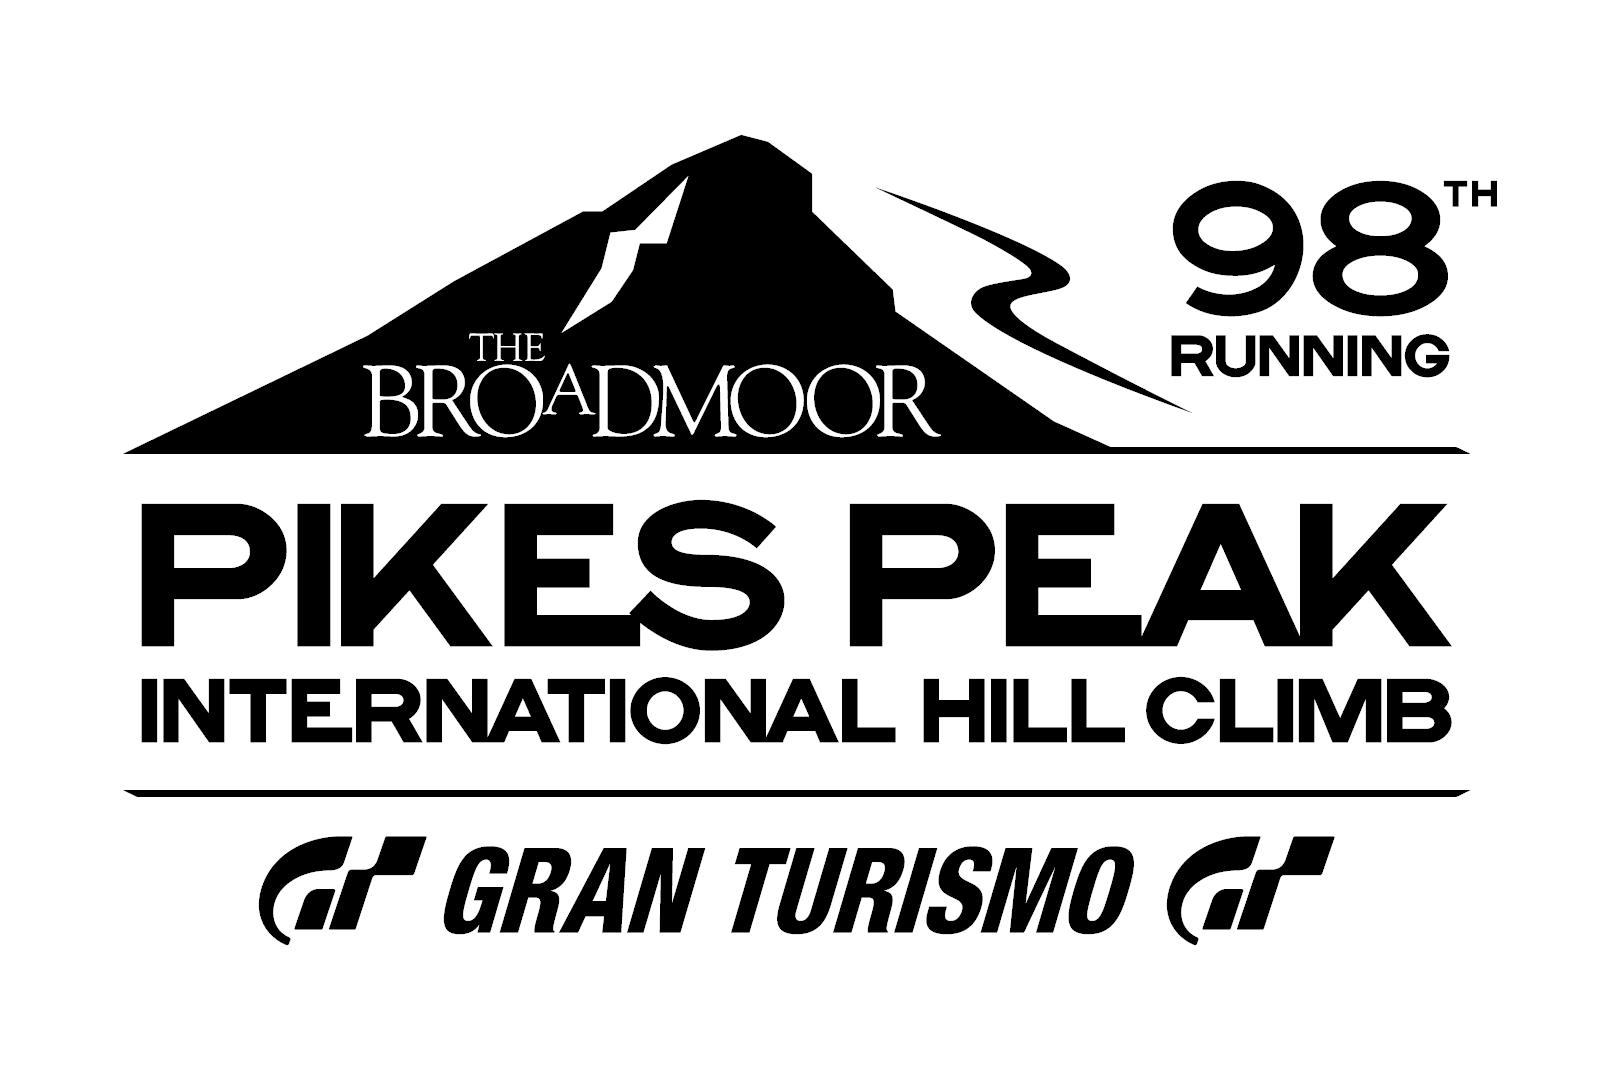 La 98ª subida a Pikes Peak se pospone a agosto